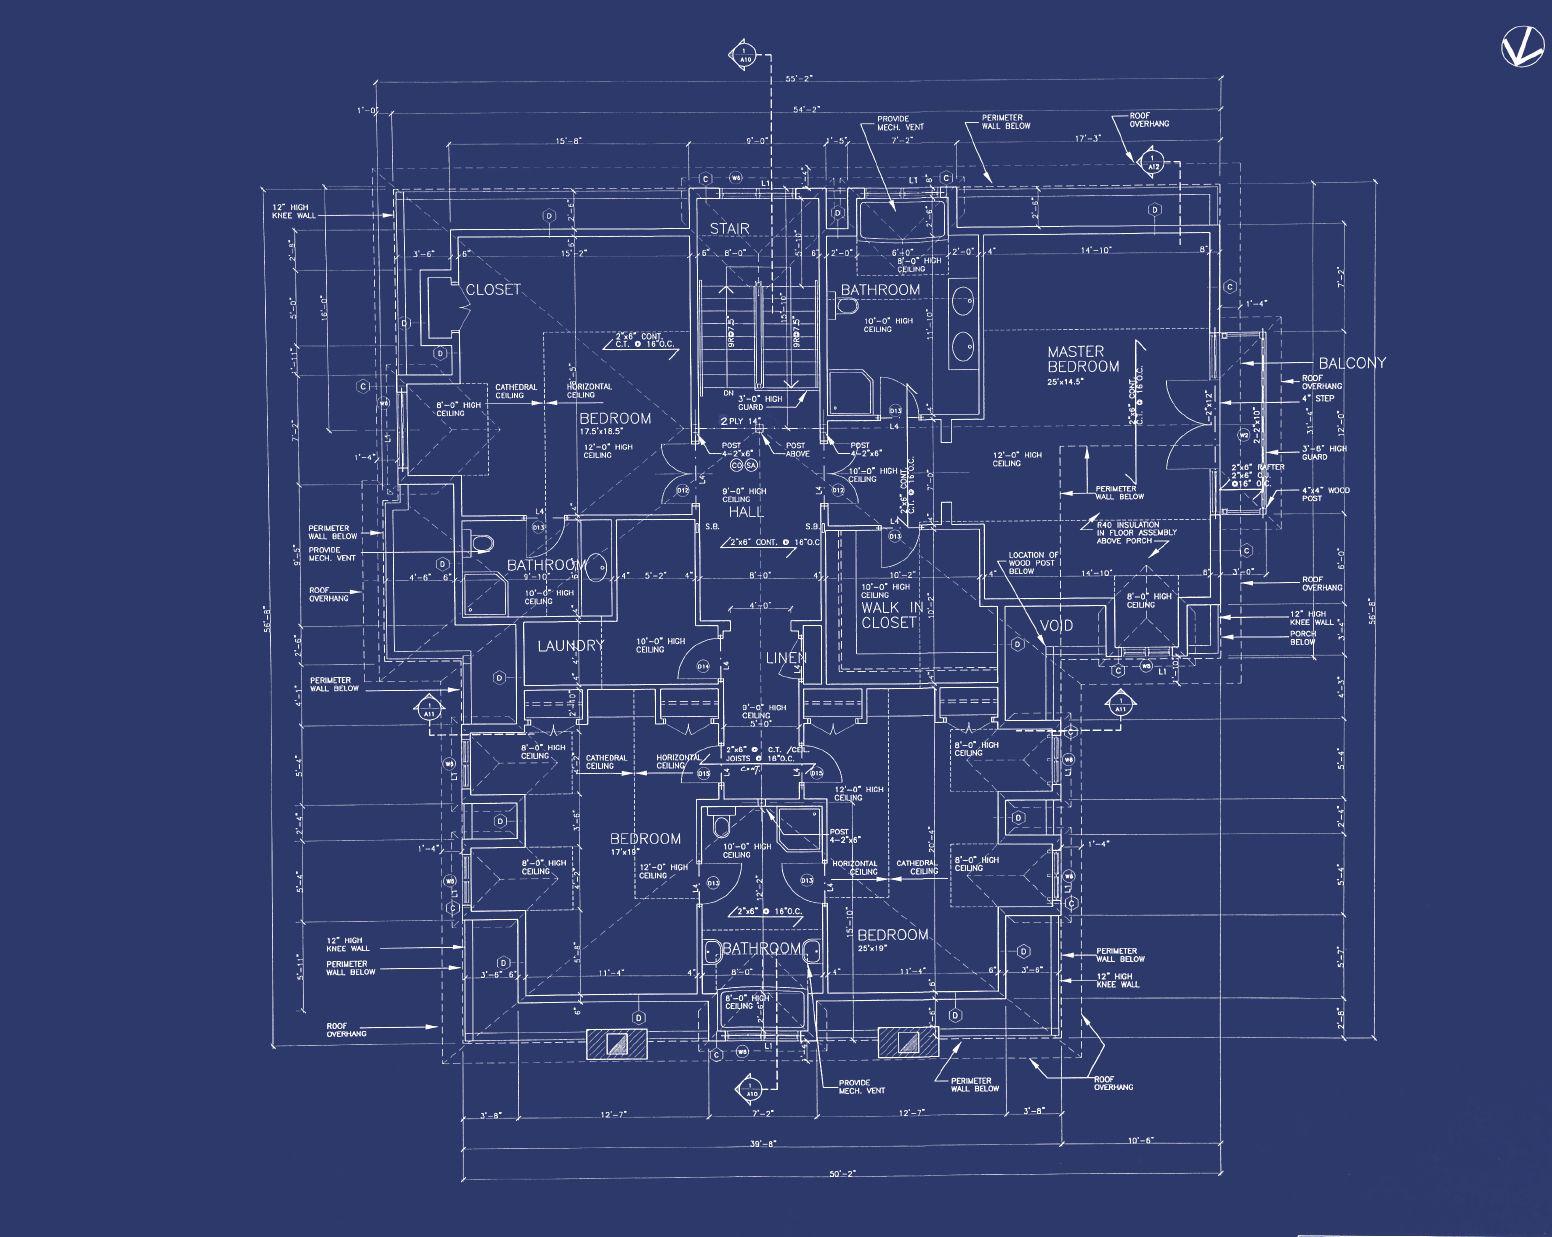 Pin by nancy saklad on greek tragedy pinterest blueprint drawing blueprint drawing malvernweather Choice Image